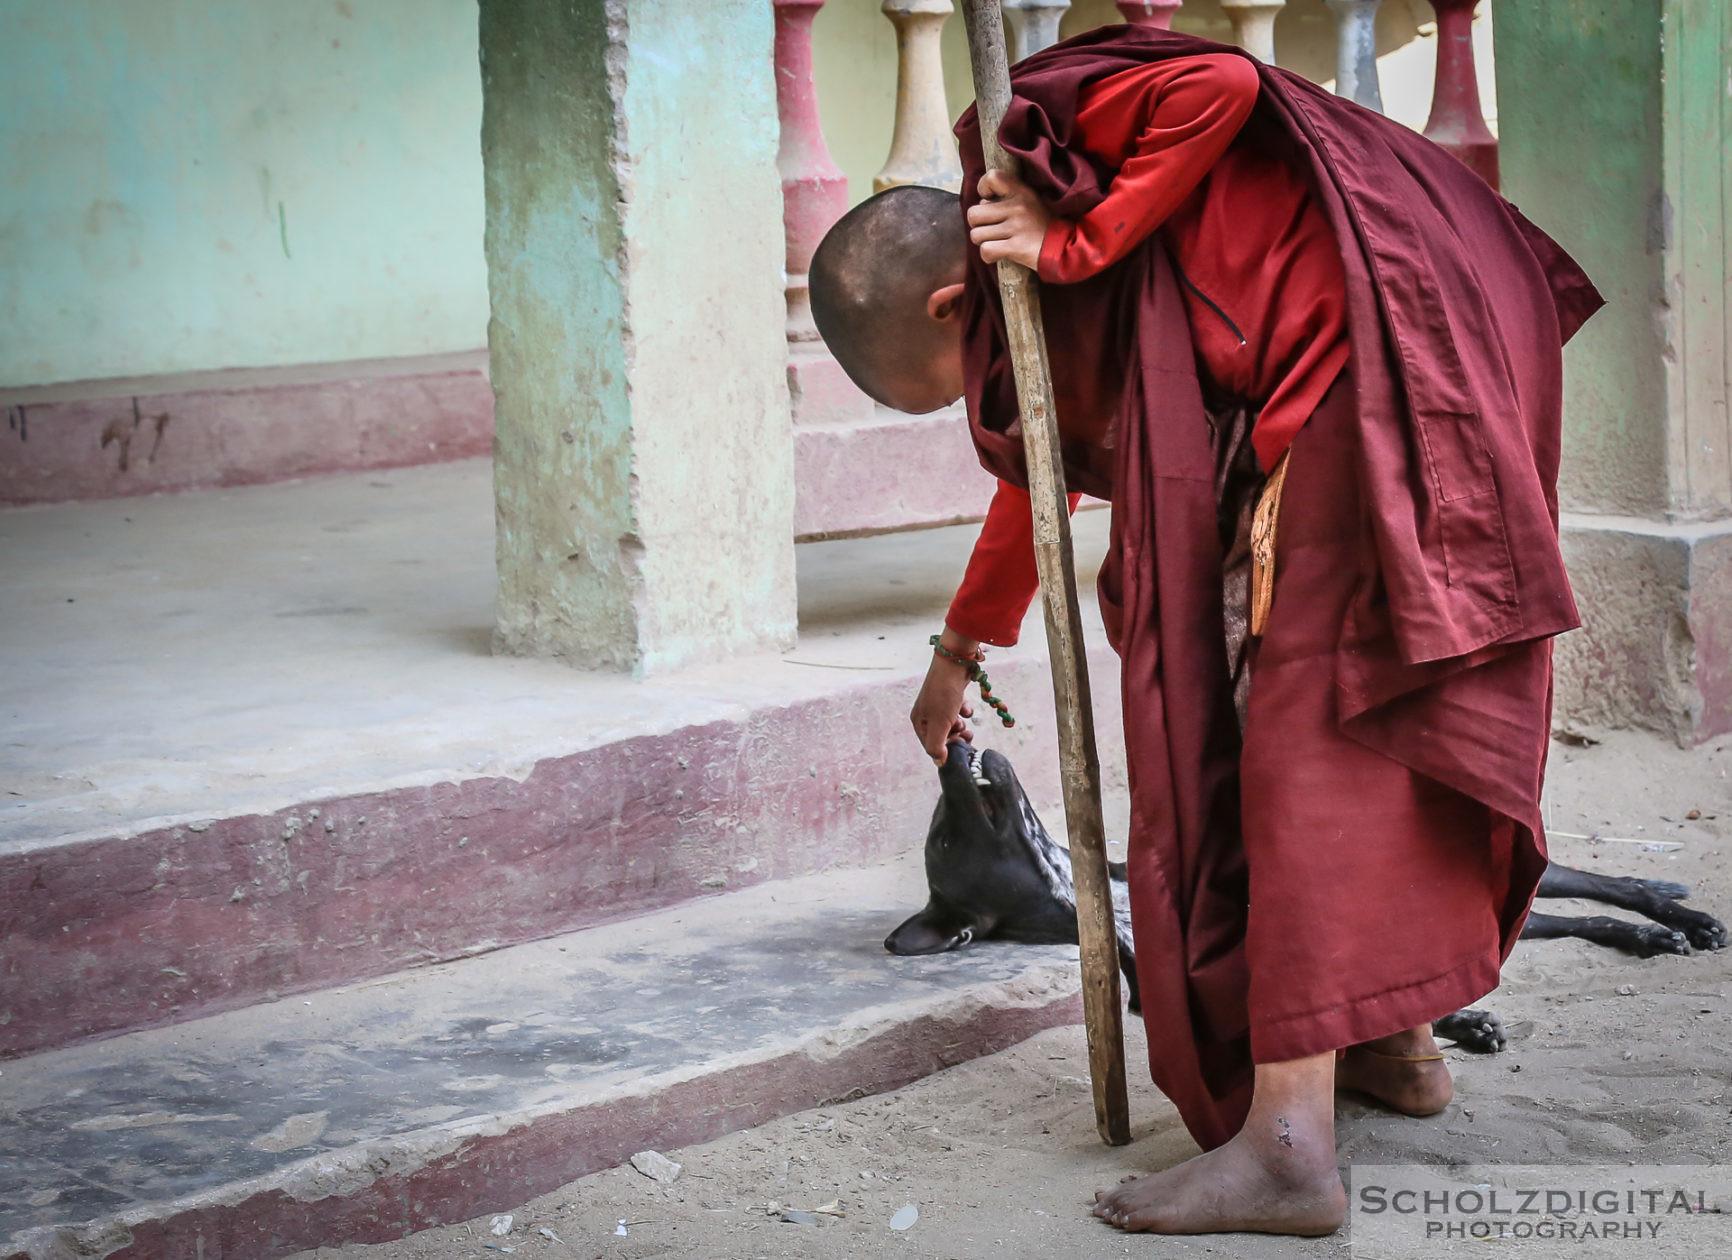 Birma, Buddah, Burma, Exploring, Monastery, Mönche, Myanmar, Nonnen, Travelling, Explorer, Scholzdigital, Southeastasia, Streetphotography, Travel, Travelling, travelphotography, Wanderlust